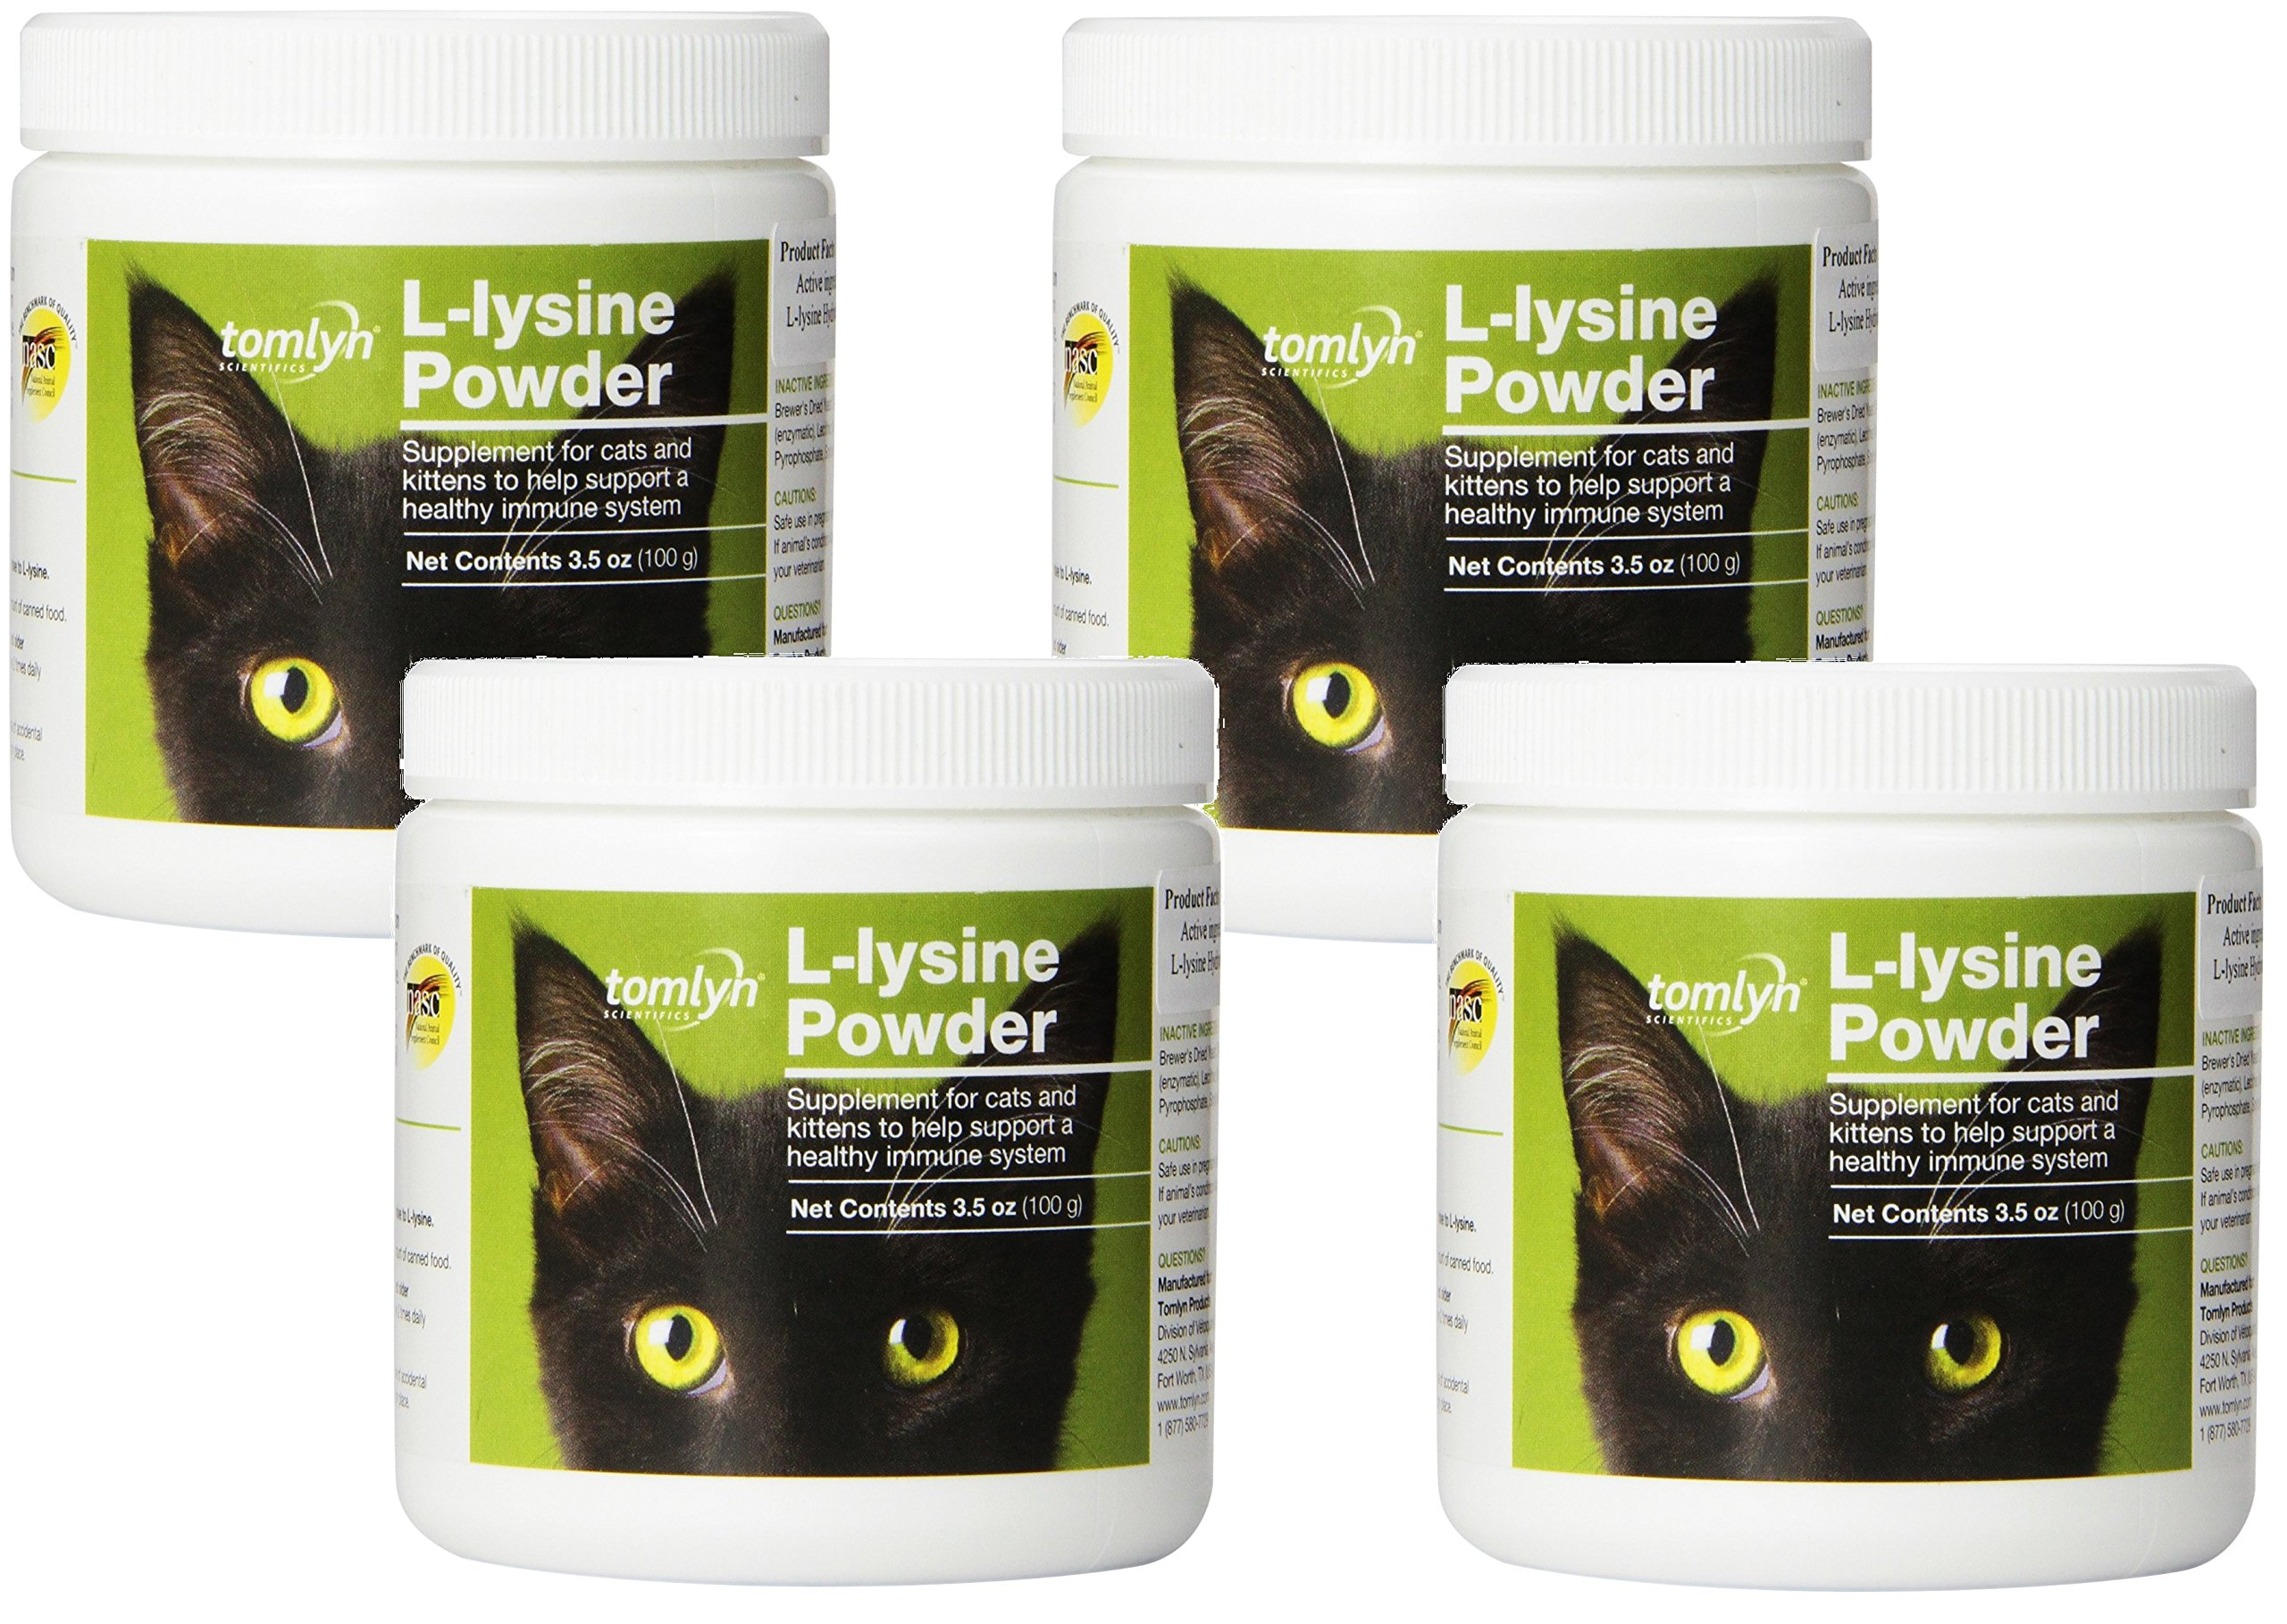 Tomlyn Scientifics L-Lysine Health Supplement Powder for Cats, 100gm Jars (4 Pack)